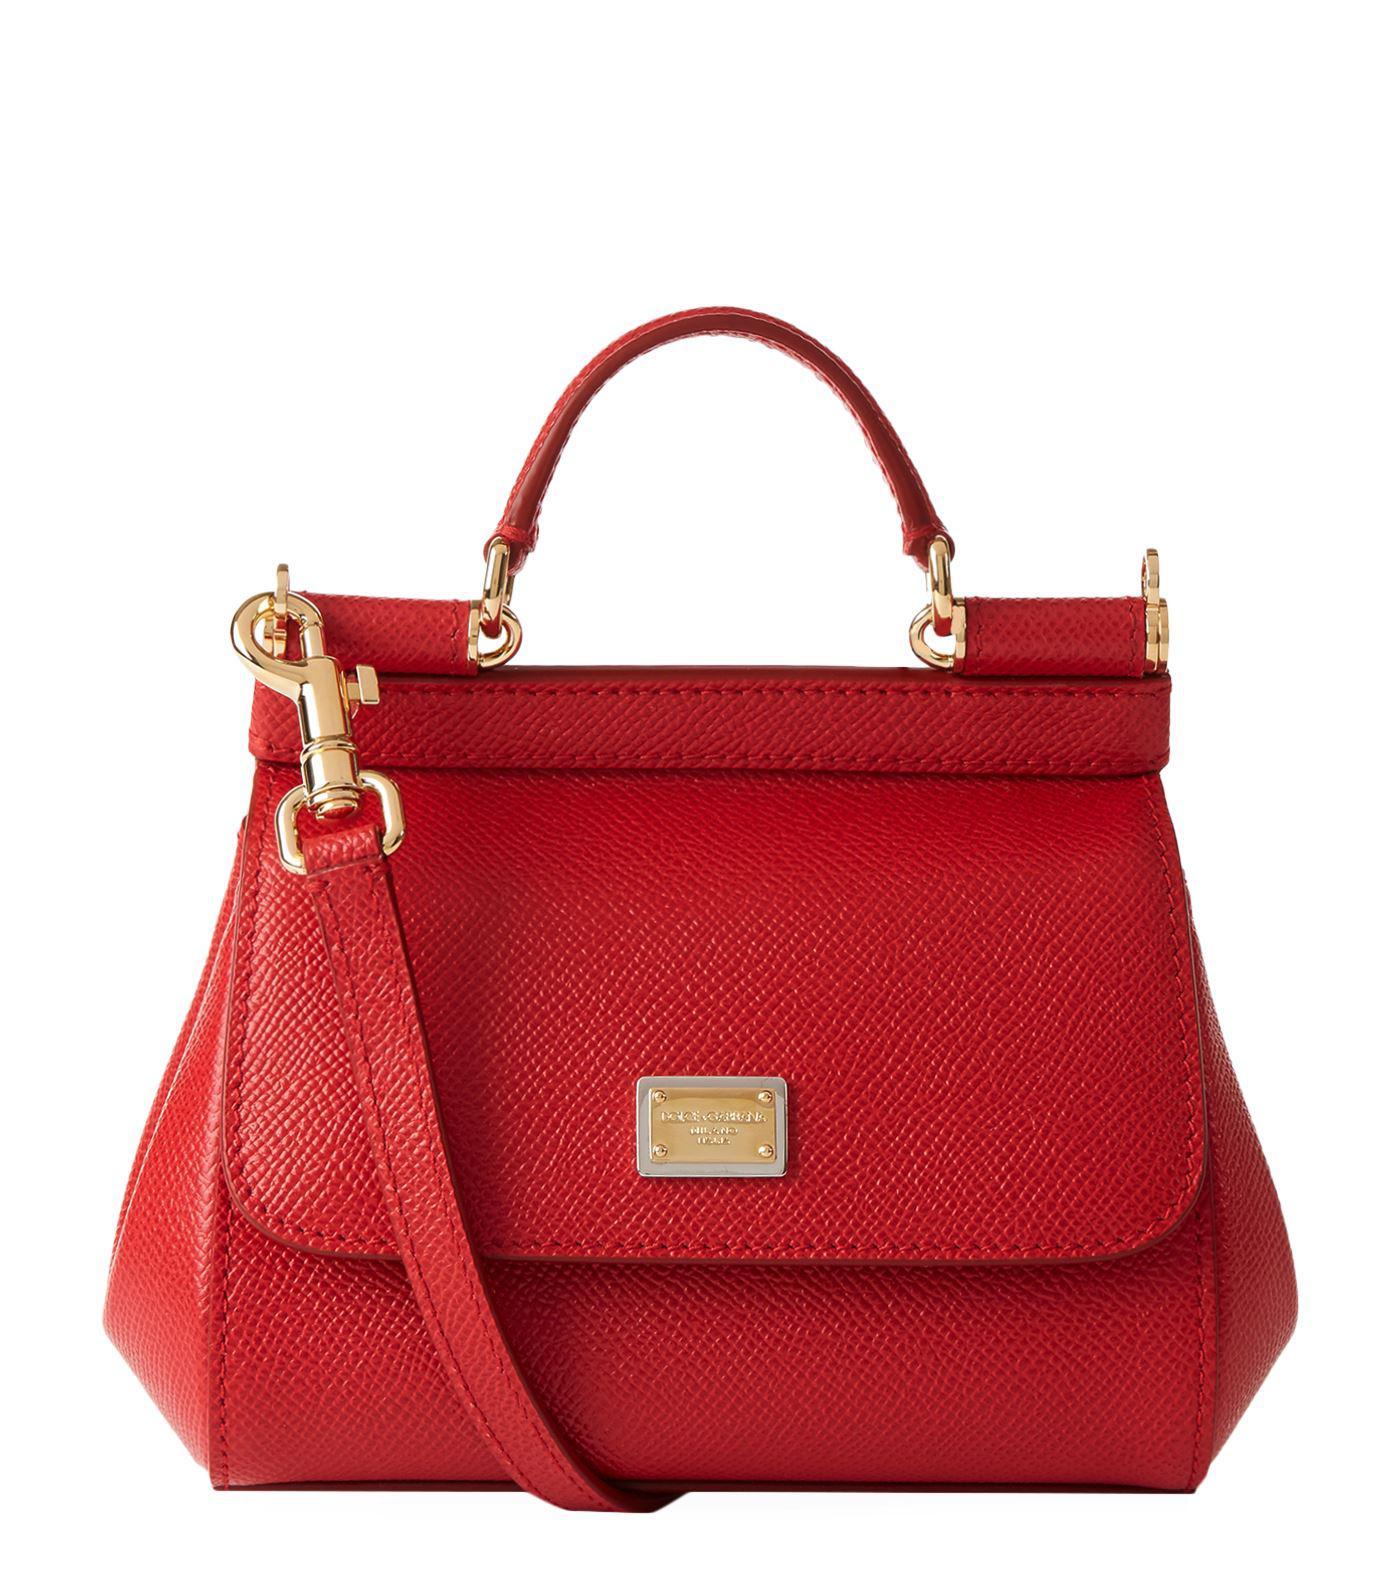 Lyst - Dolce   Gabbana Mini Leather Sicily Bag in Red 4e644f45ccba8